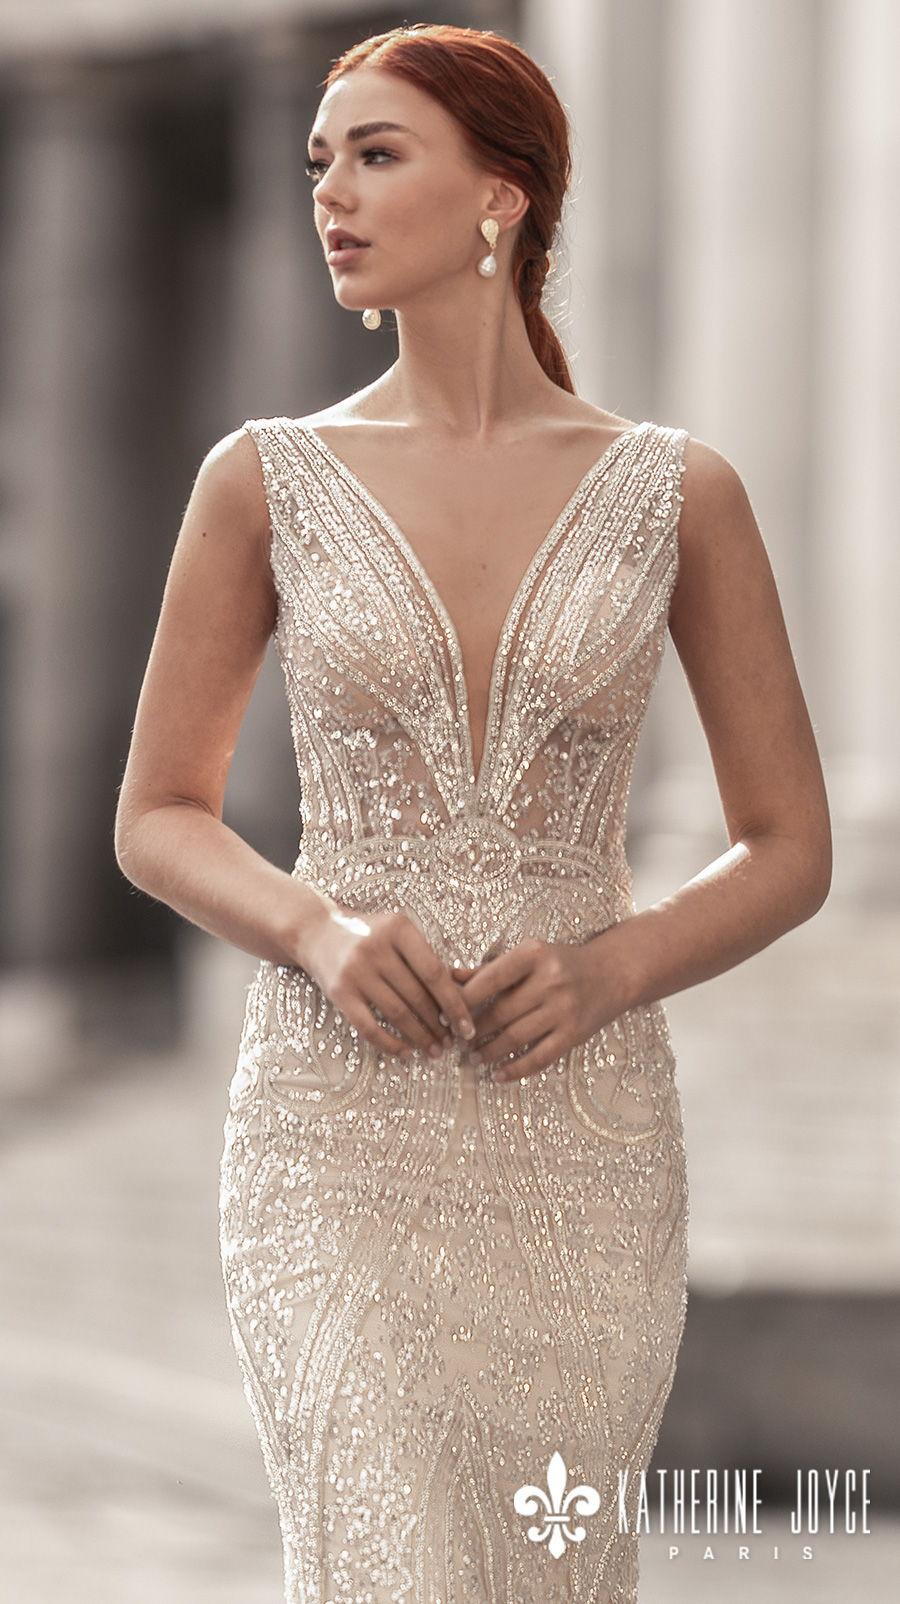 katherine joyce 2021 naples bridal sleeveless deep v neck full embellishment glitter glamorous elegant gold sheath wedding dress v back sweep train (sirena) zv